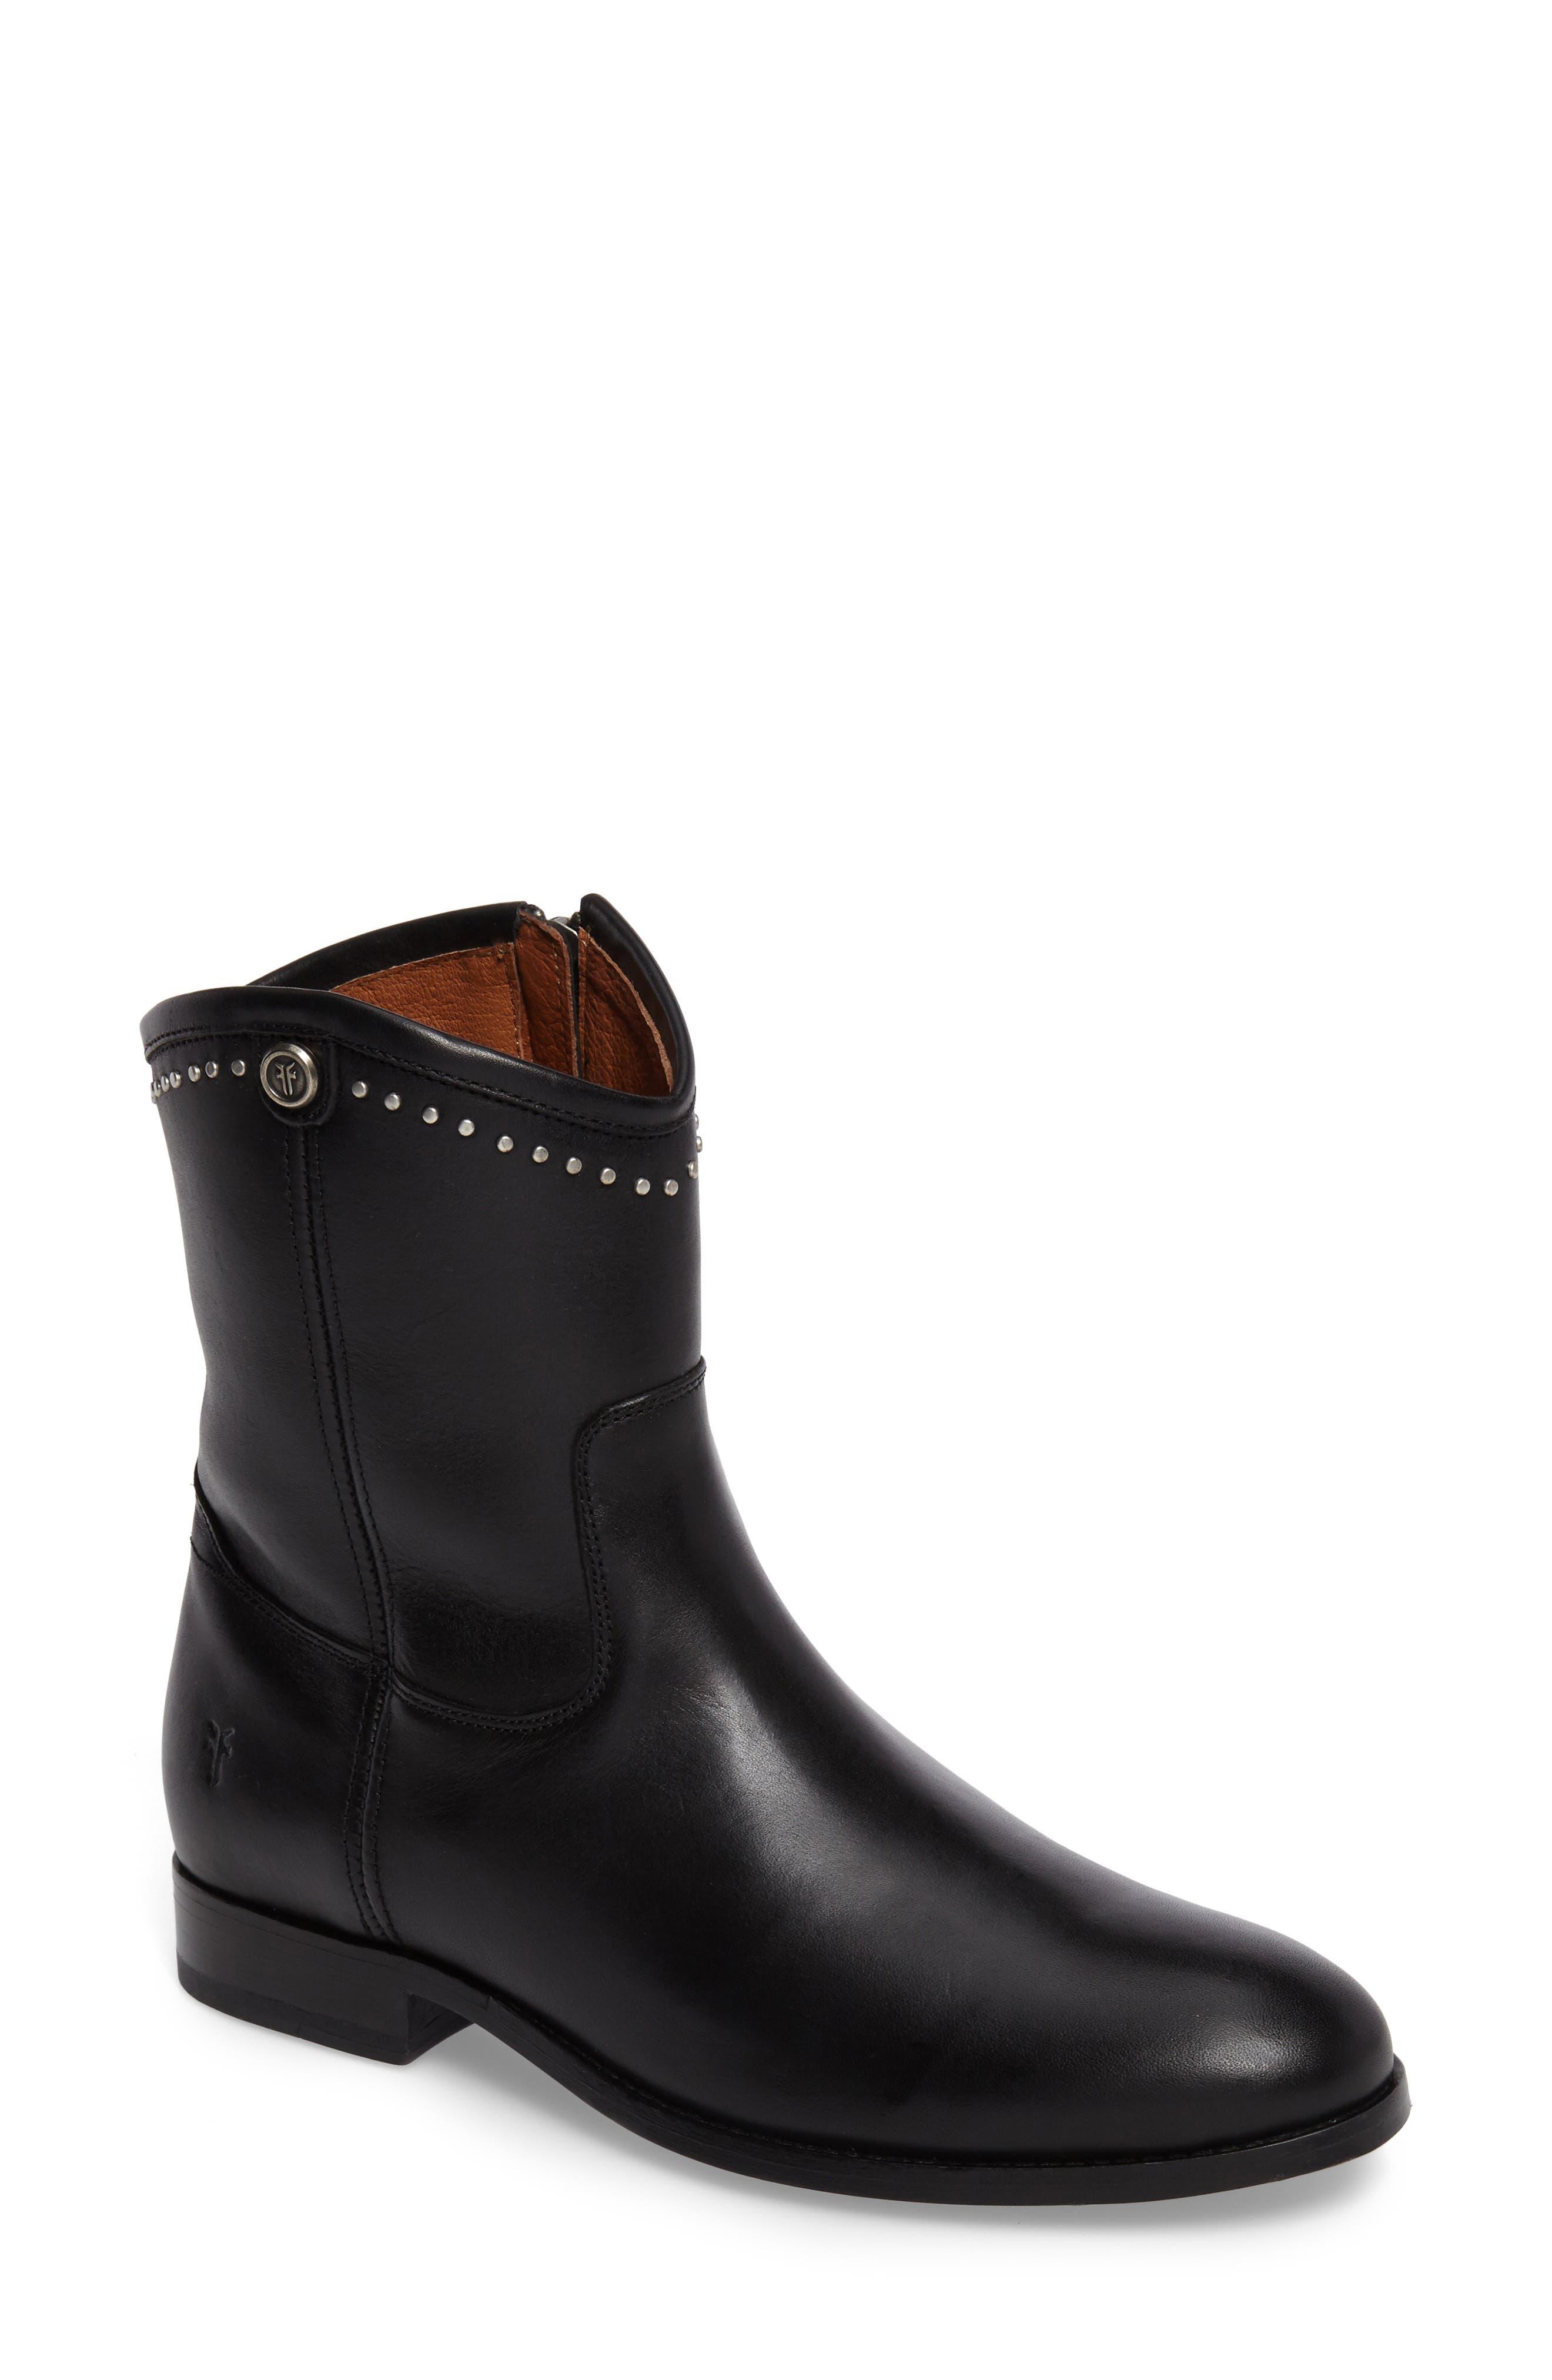 Melissa Stud Short Boot,                         Main,                         color, BLACK